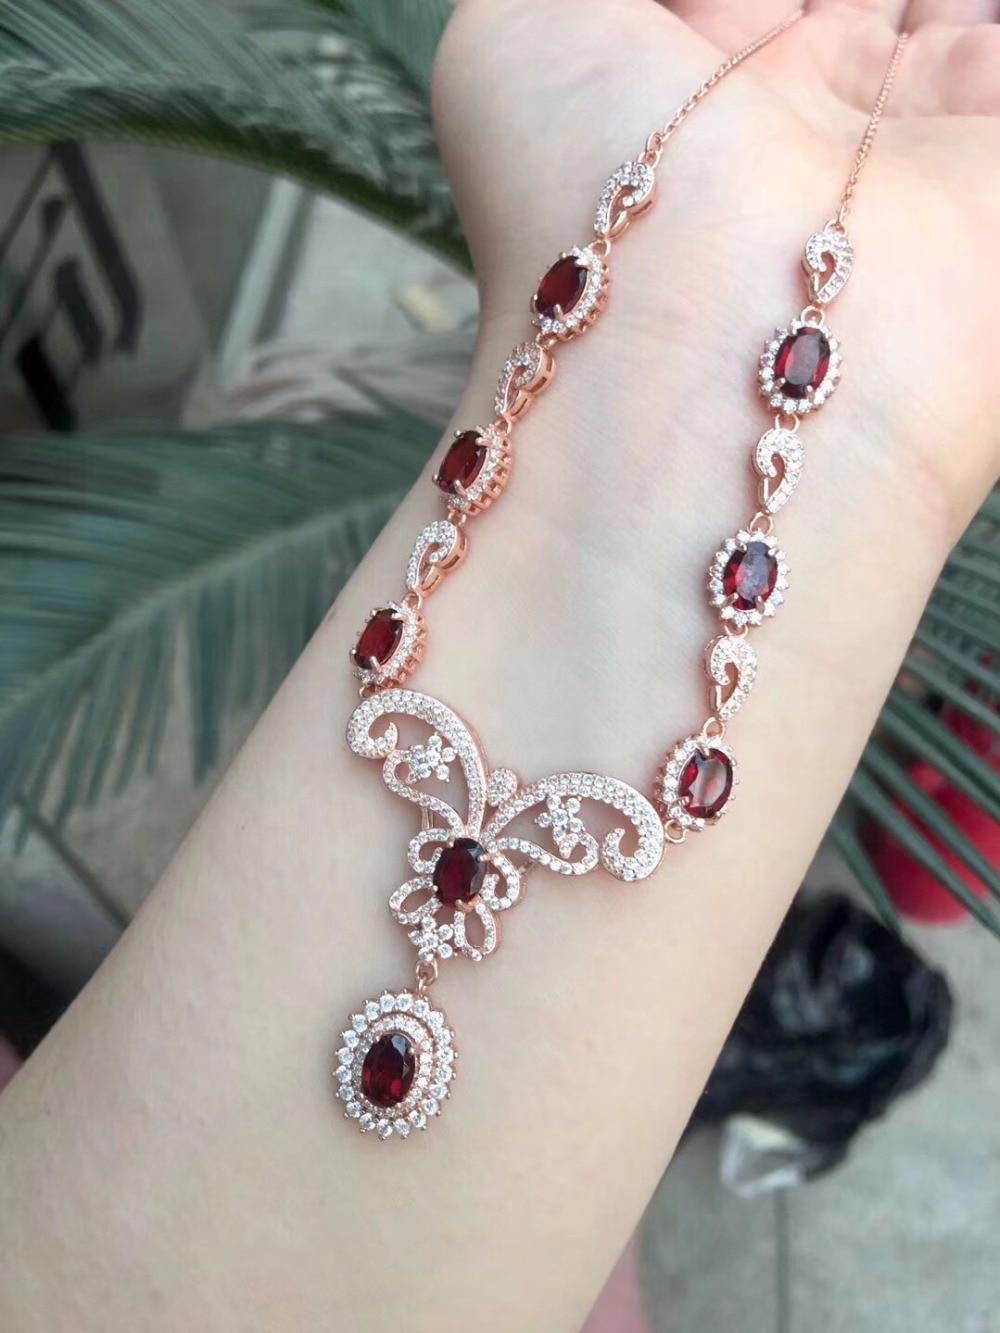 Uloveido Red Garnet Wedding Pendant Necklace Women 925 Sterling Silver Gemstone Luxurious Necklace Pendant for Girl